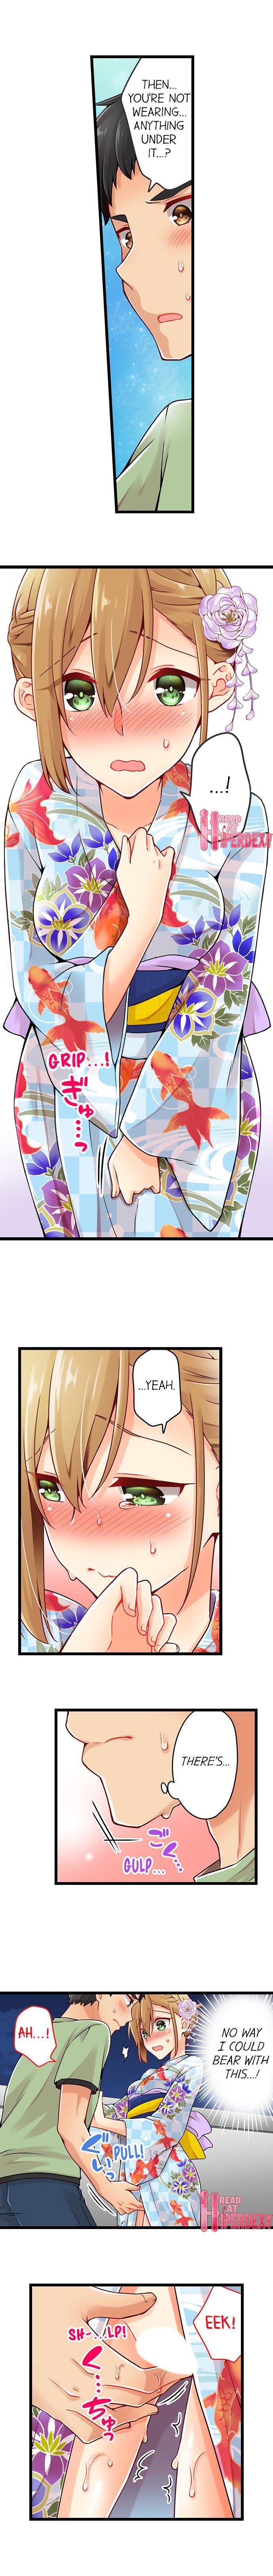 Ren Arisugawa Is Actually A Girl 783